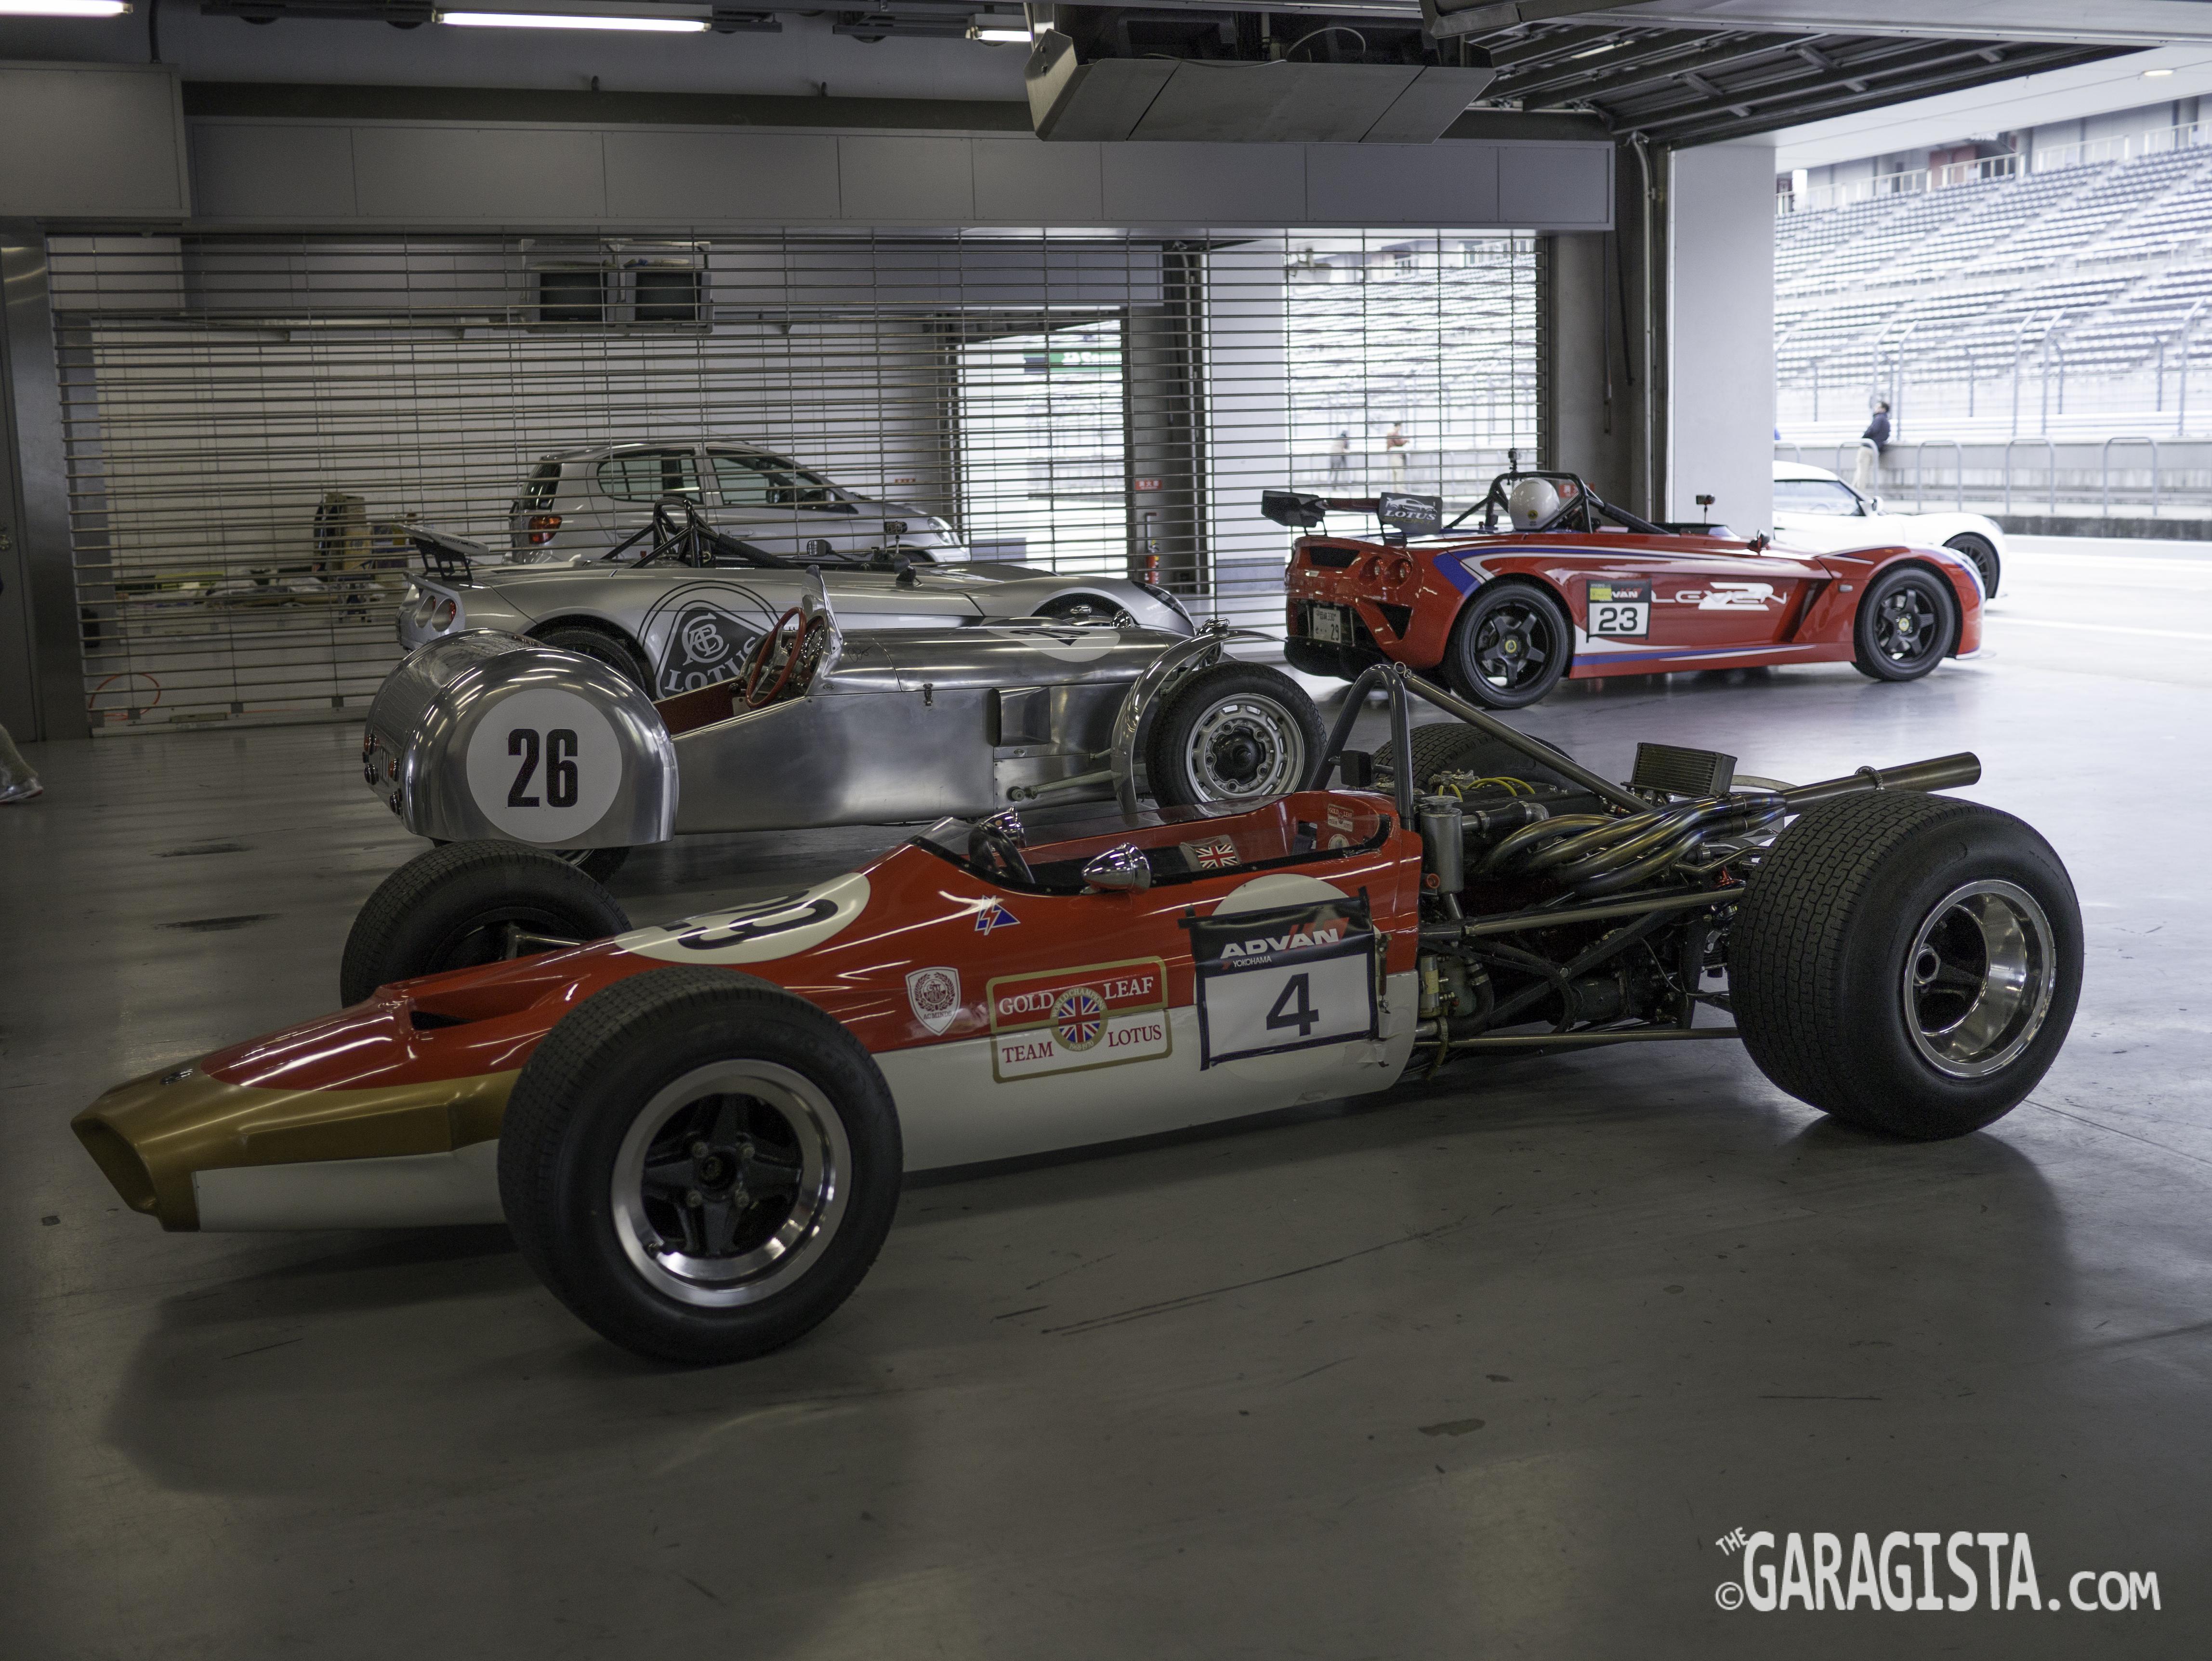 Japan Lotus Day 2012 ジャパン・ロータスデー2012: Part 3 Monoposto Cars |